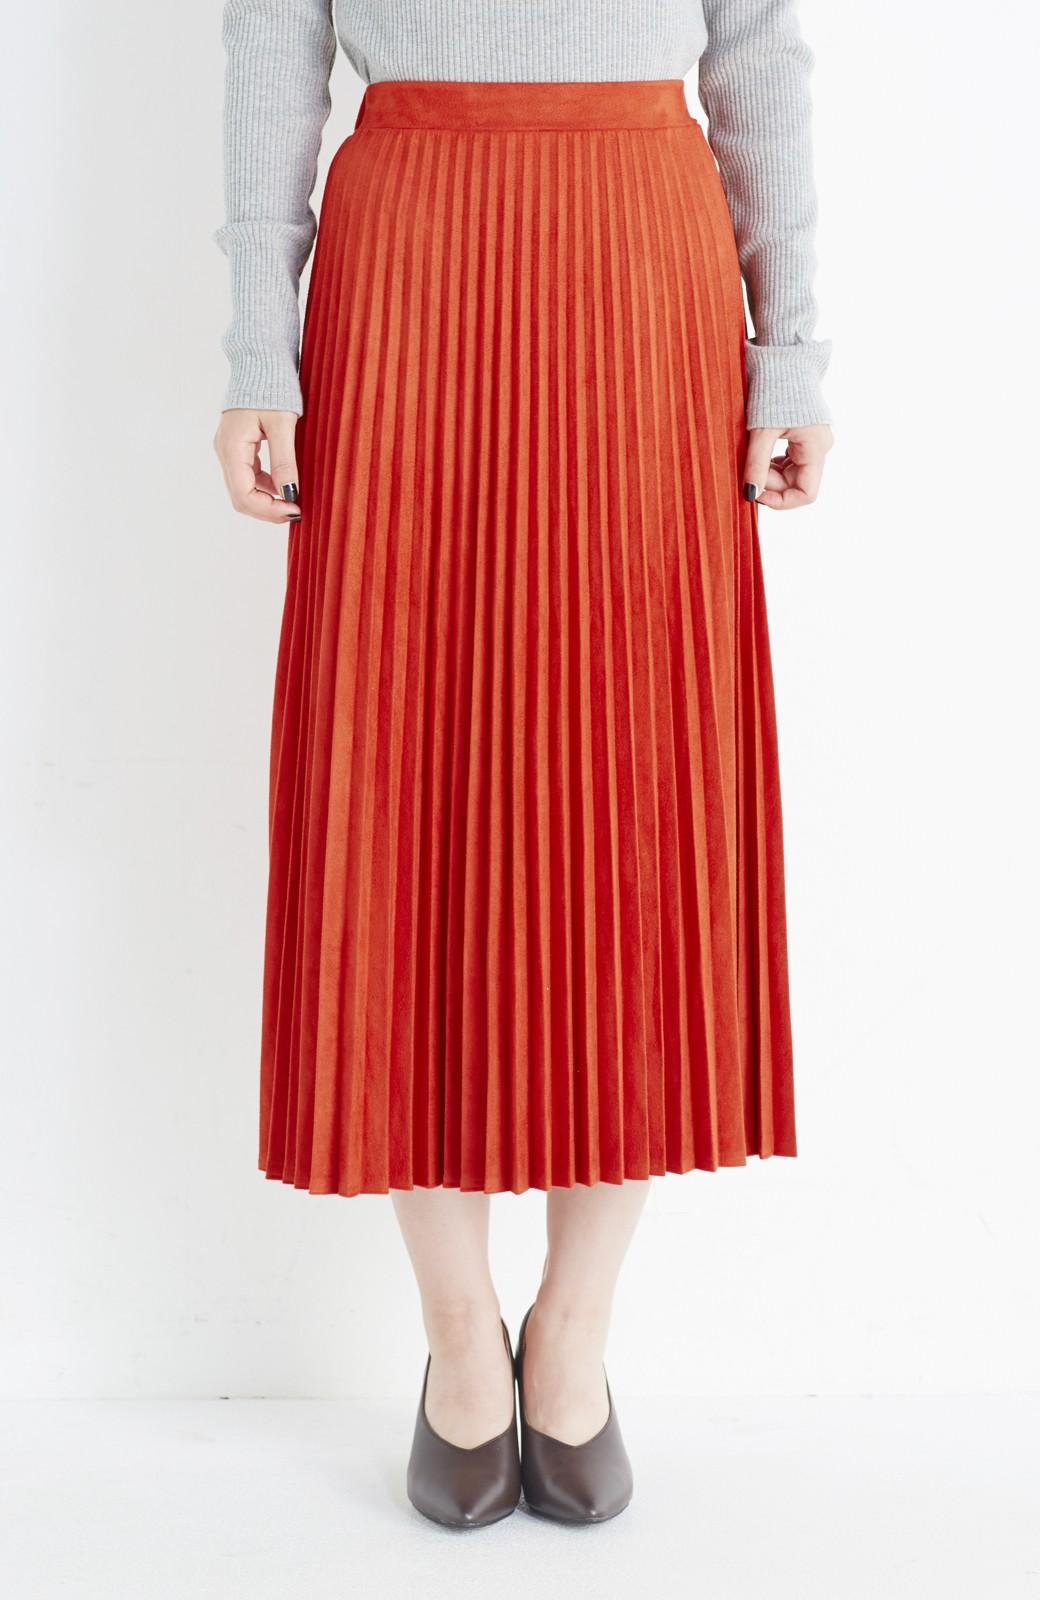 haco! 楽して女っぽい フェイクスエードのプリーツスカート  by que made me <オレンジ系その他>の商品写真2